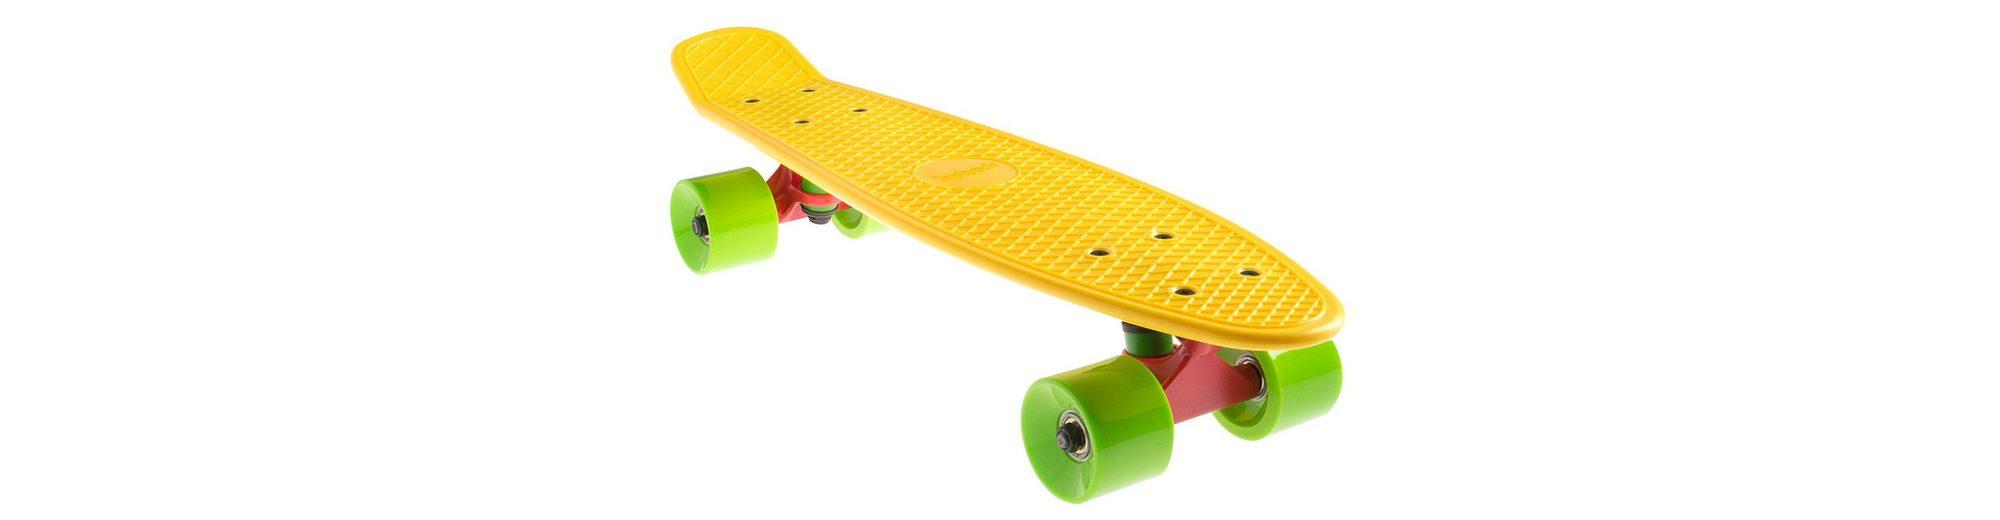 Sportplus Ezy! Mini Cruiser, Mini Skateboard, »Yellow SP-SB-305«